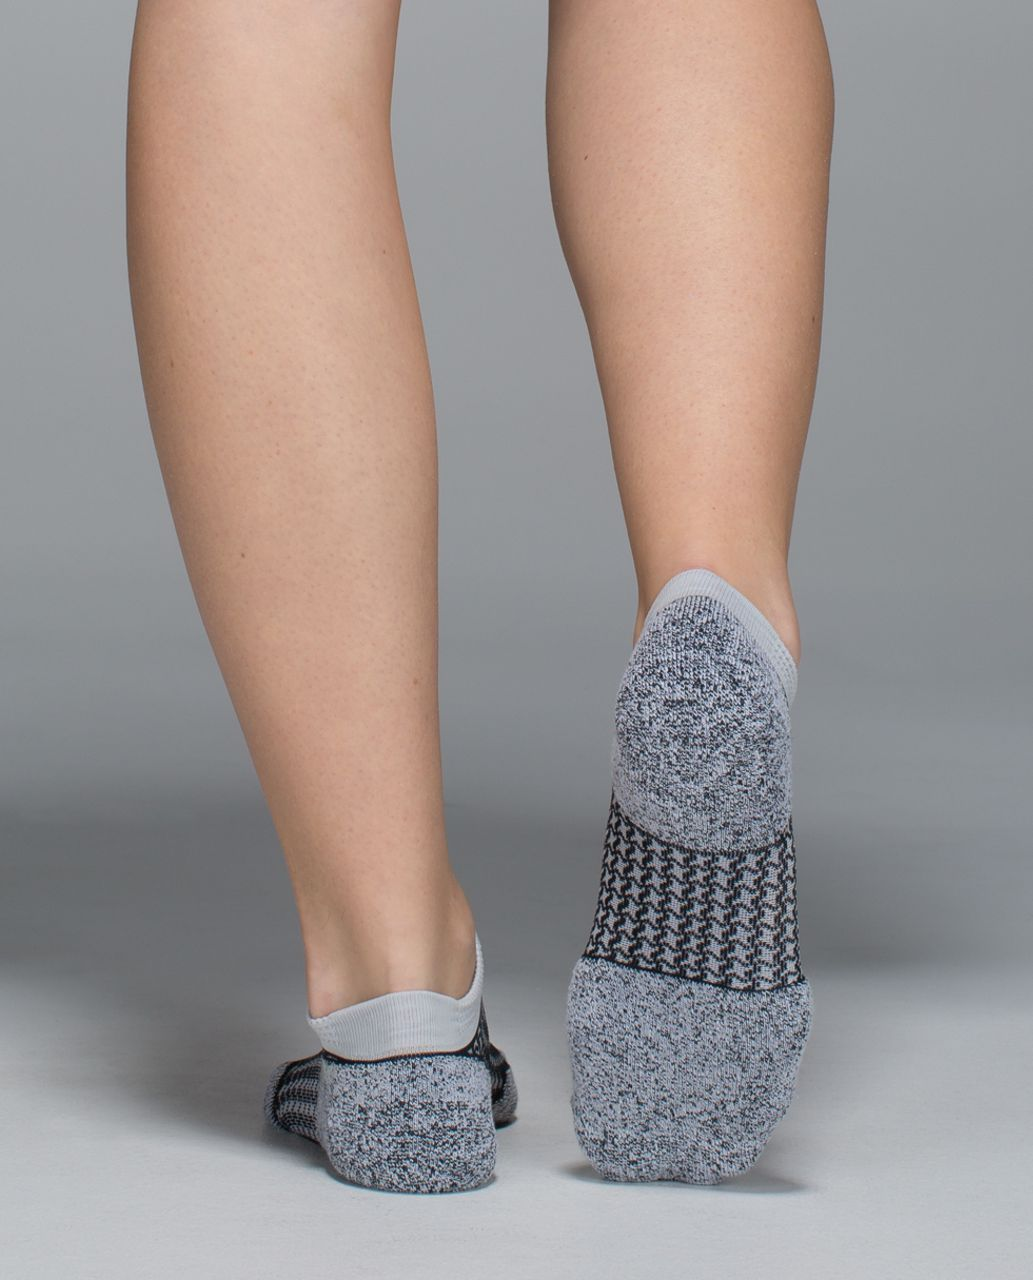 Lululemon Women's Ultimate Padded Run Sock - Houndstooth Silverspoon